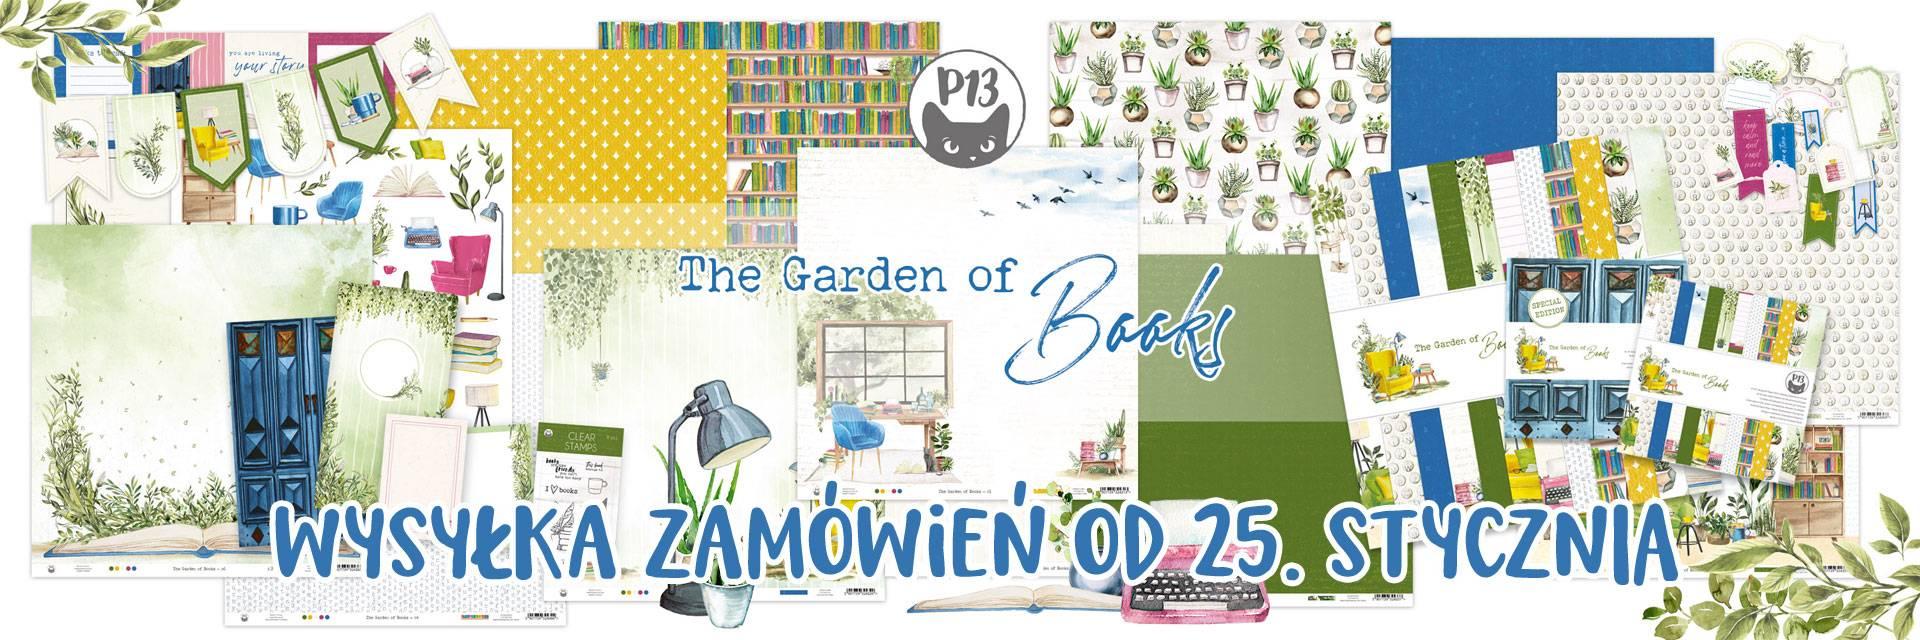 https://store.p13.com.pl/pl/90-nowosc-the-garden-of-books